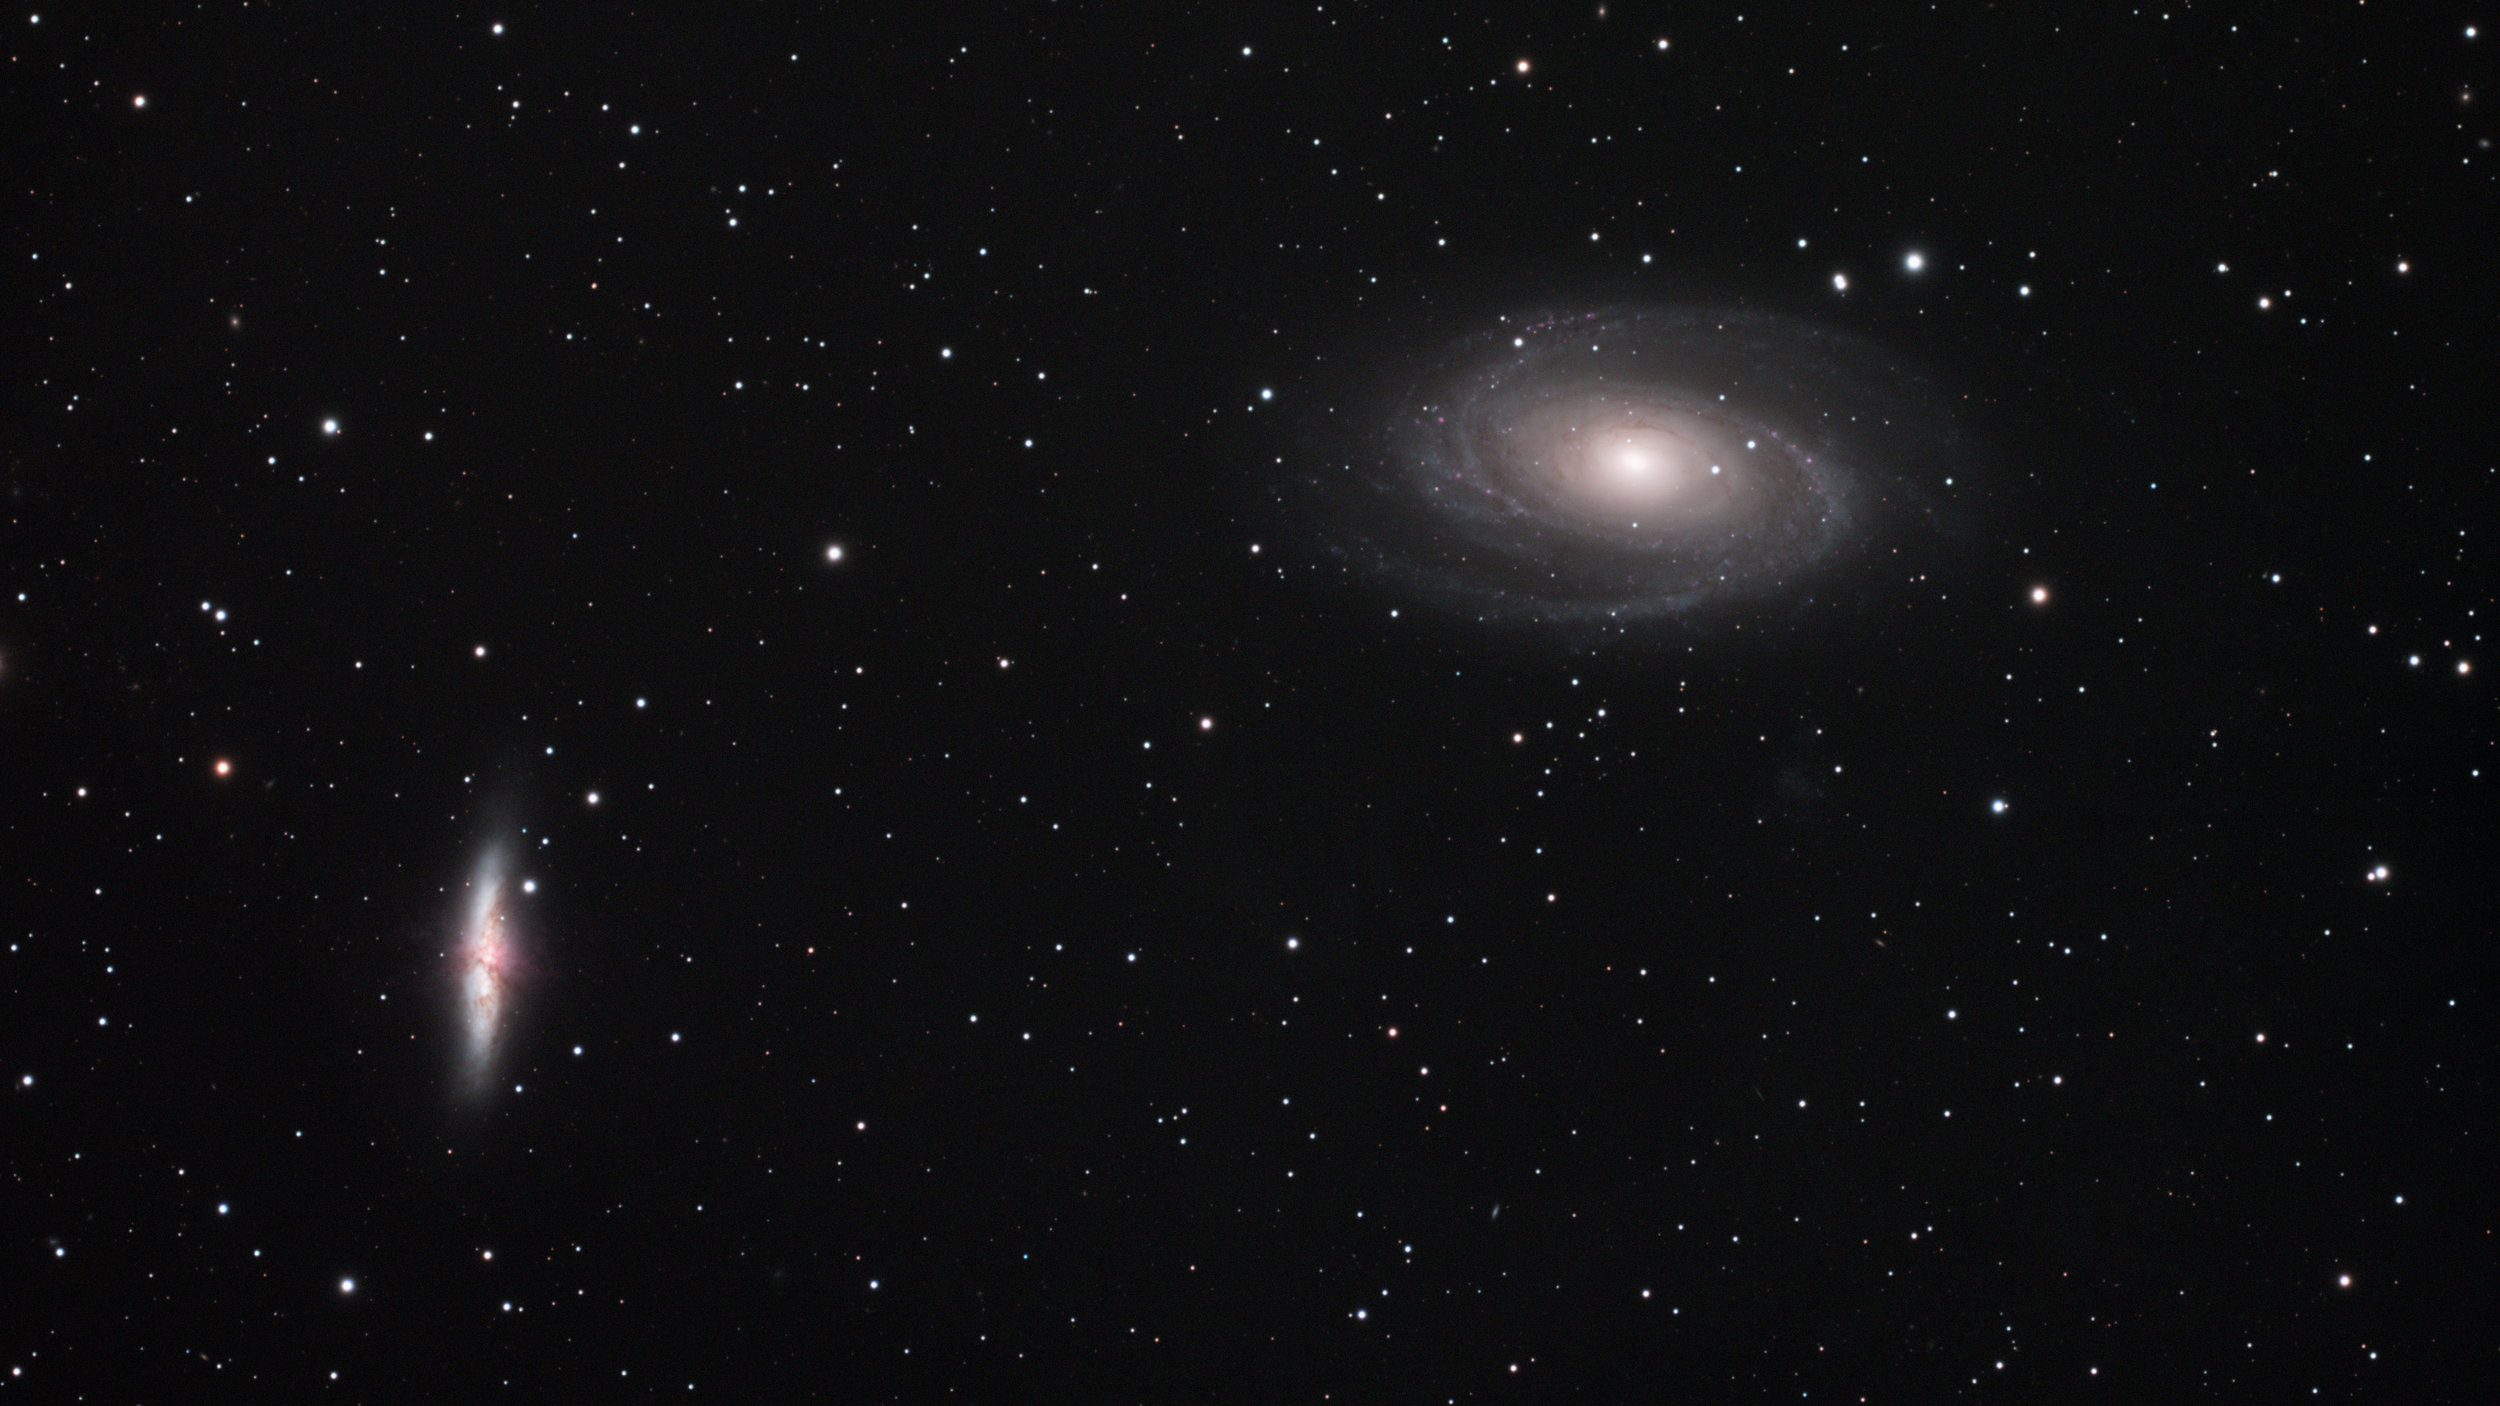 Bode's Galaxy and Cigar Galaxy ZWO530 20190116 03.jpg